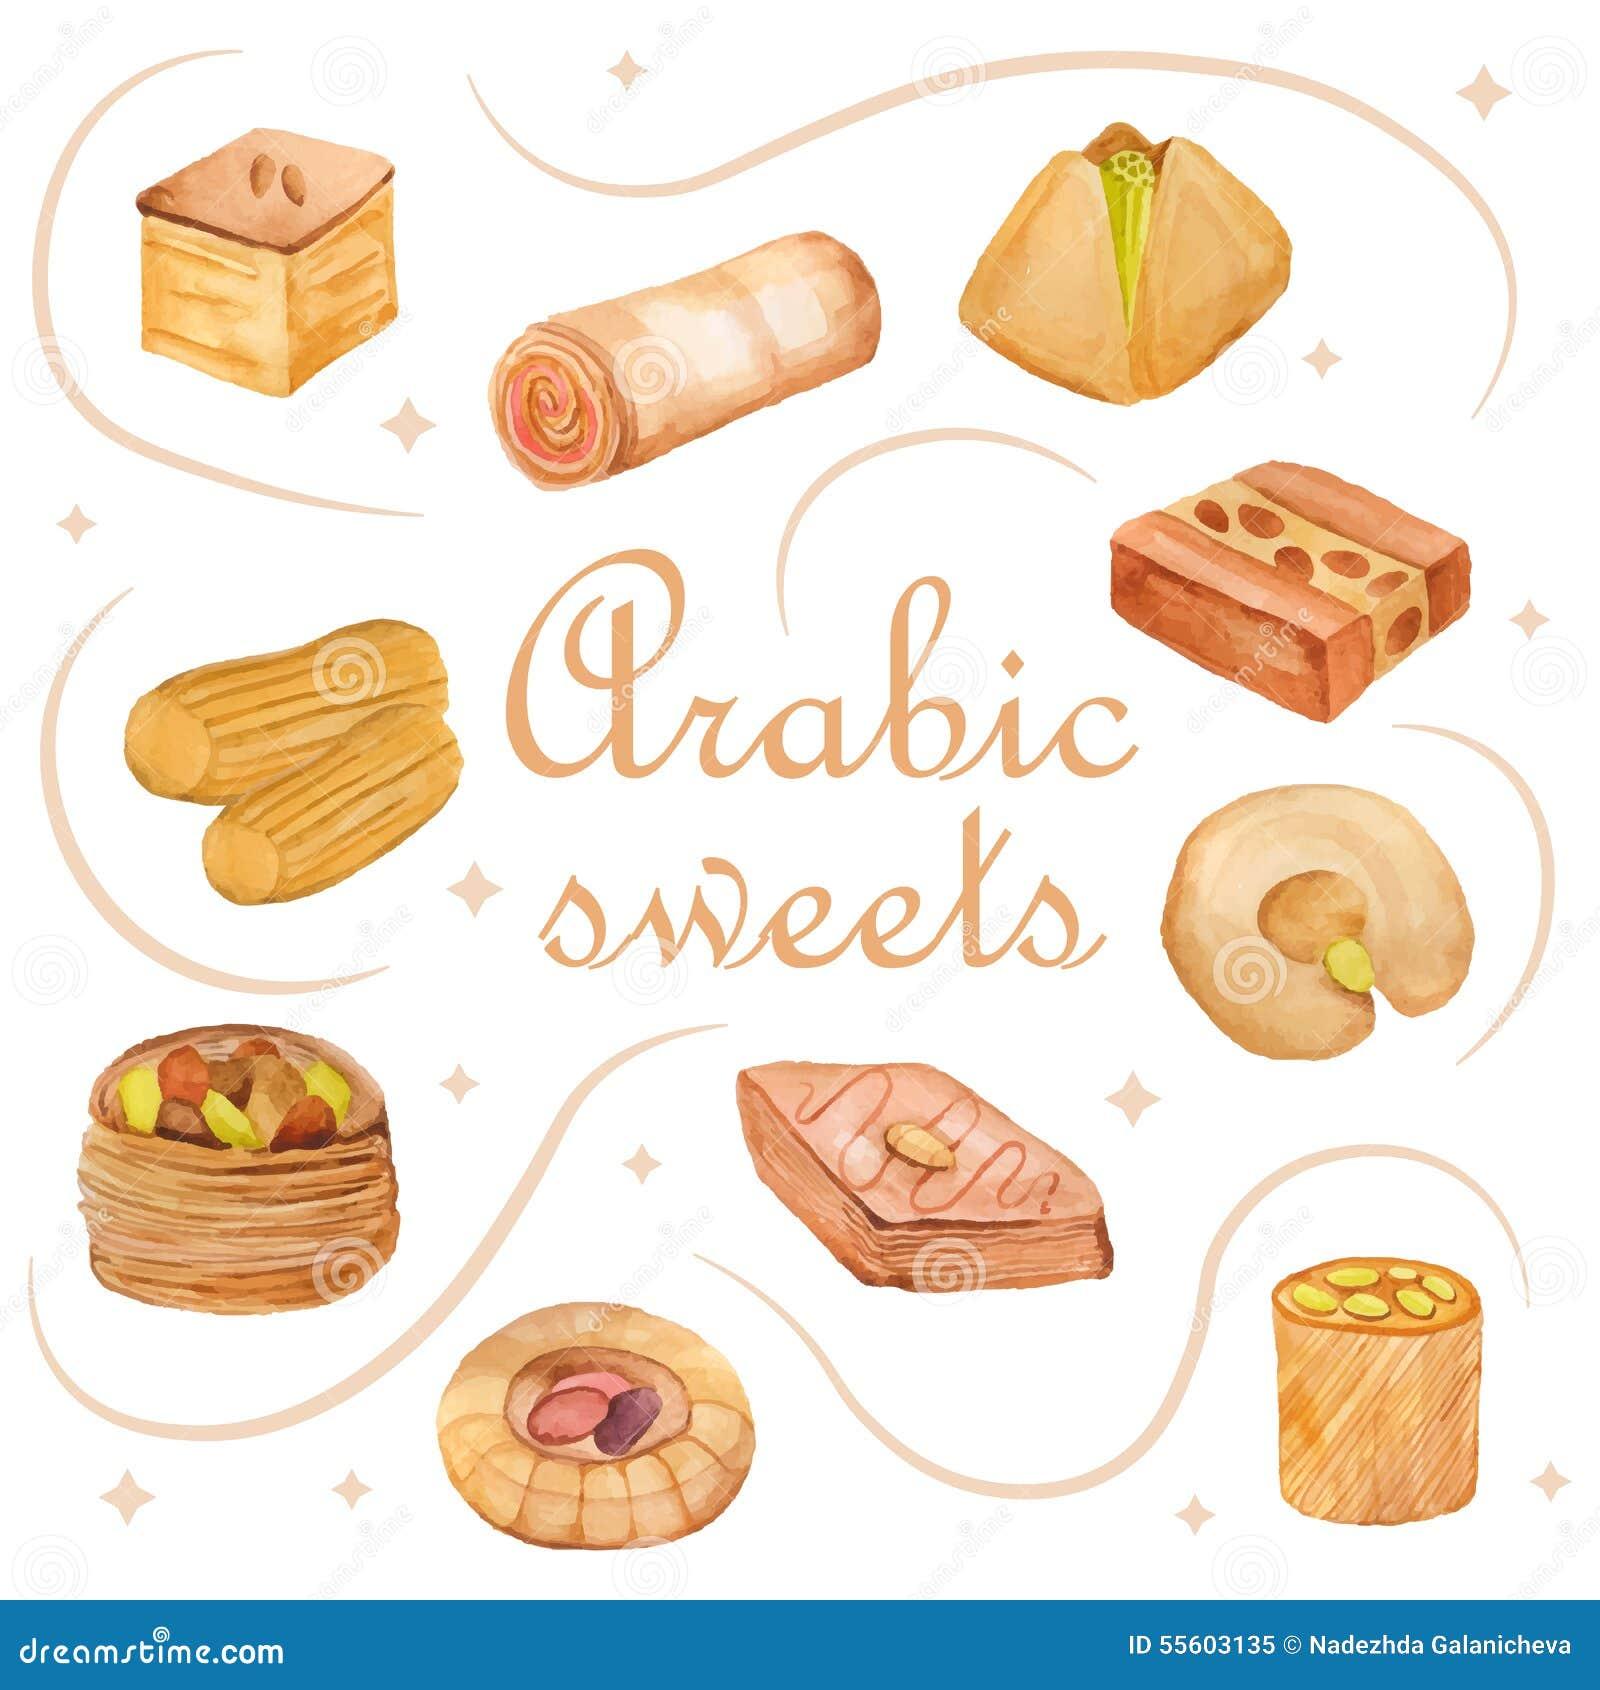 55603135 for Arabic cuisine names